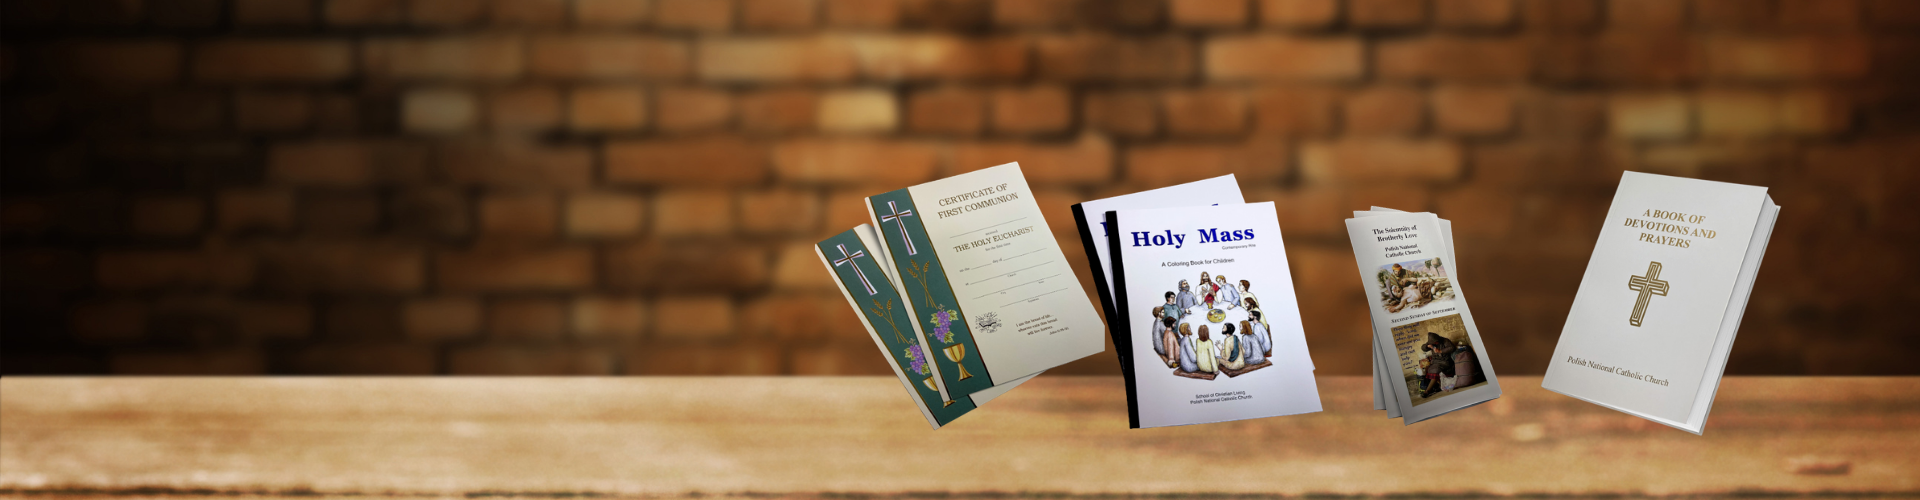 Polish National Catholic Church - Bookstore